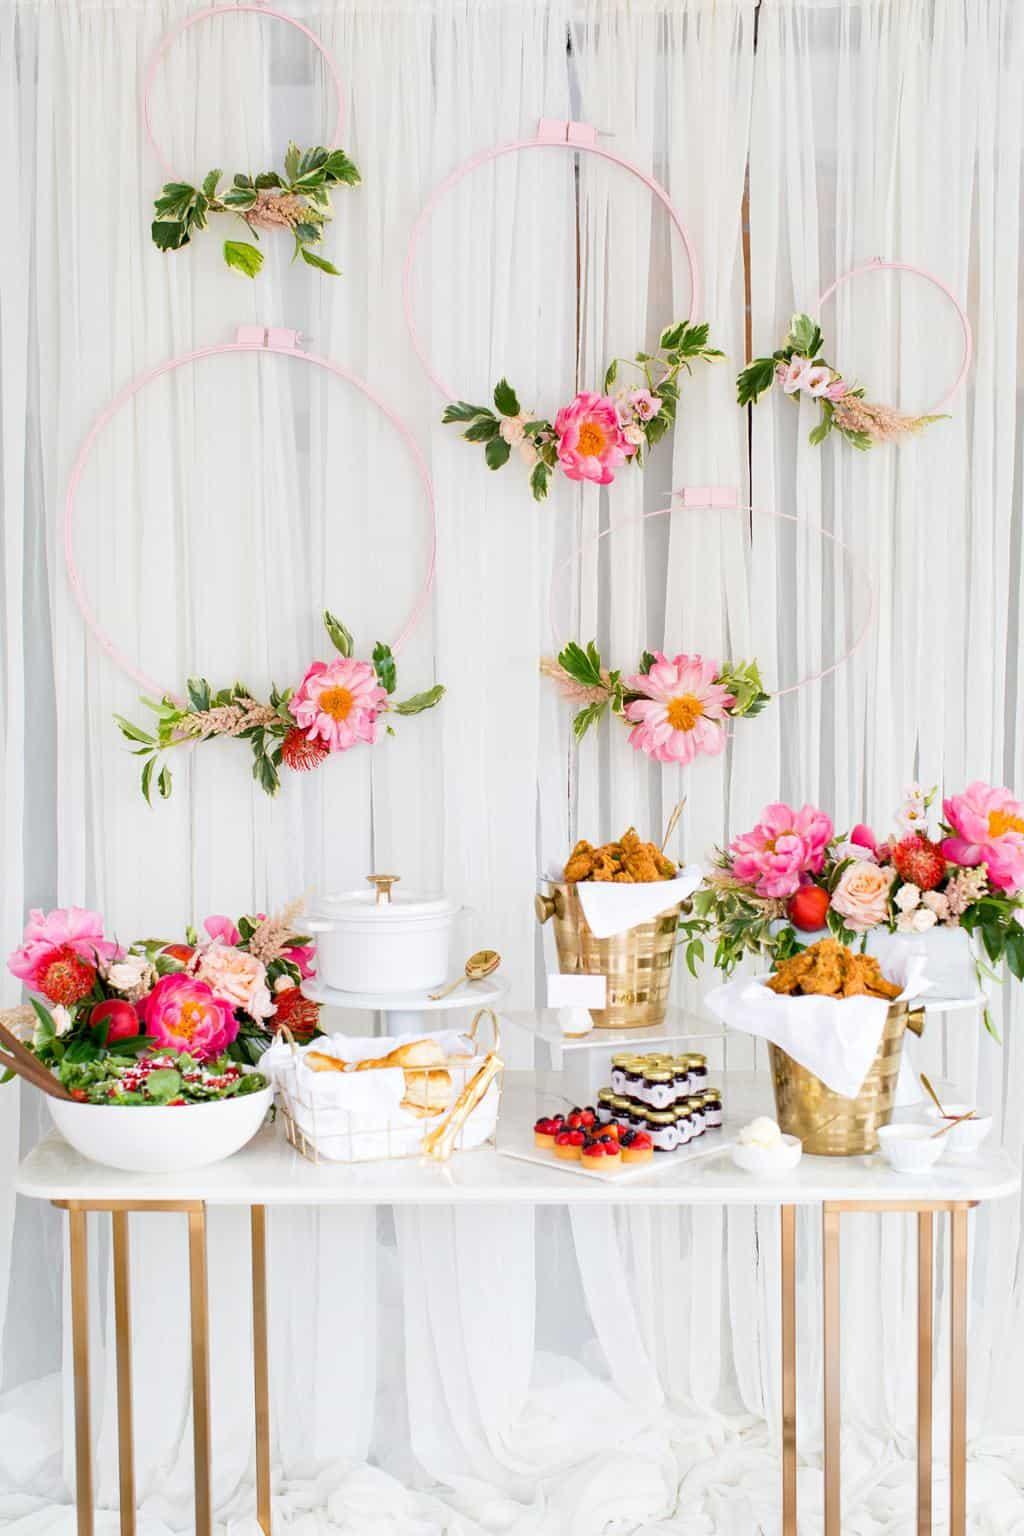 Southern Inspired Bridal Shower  Sugar  Cloth Entertaining